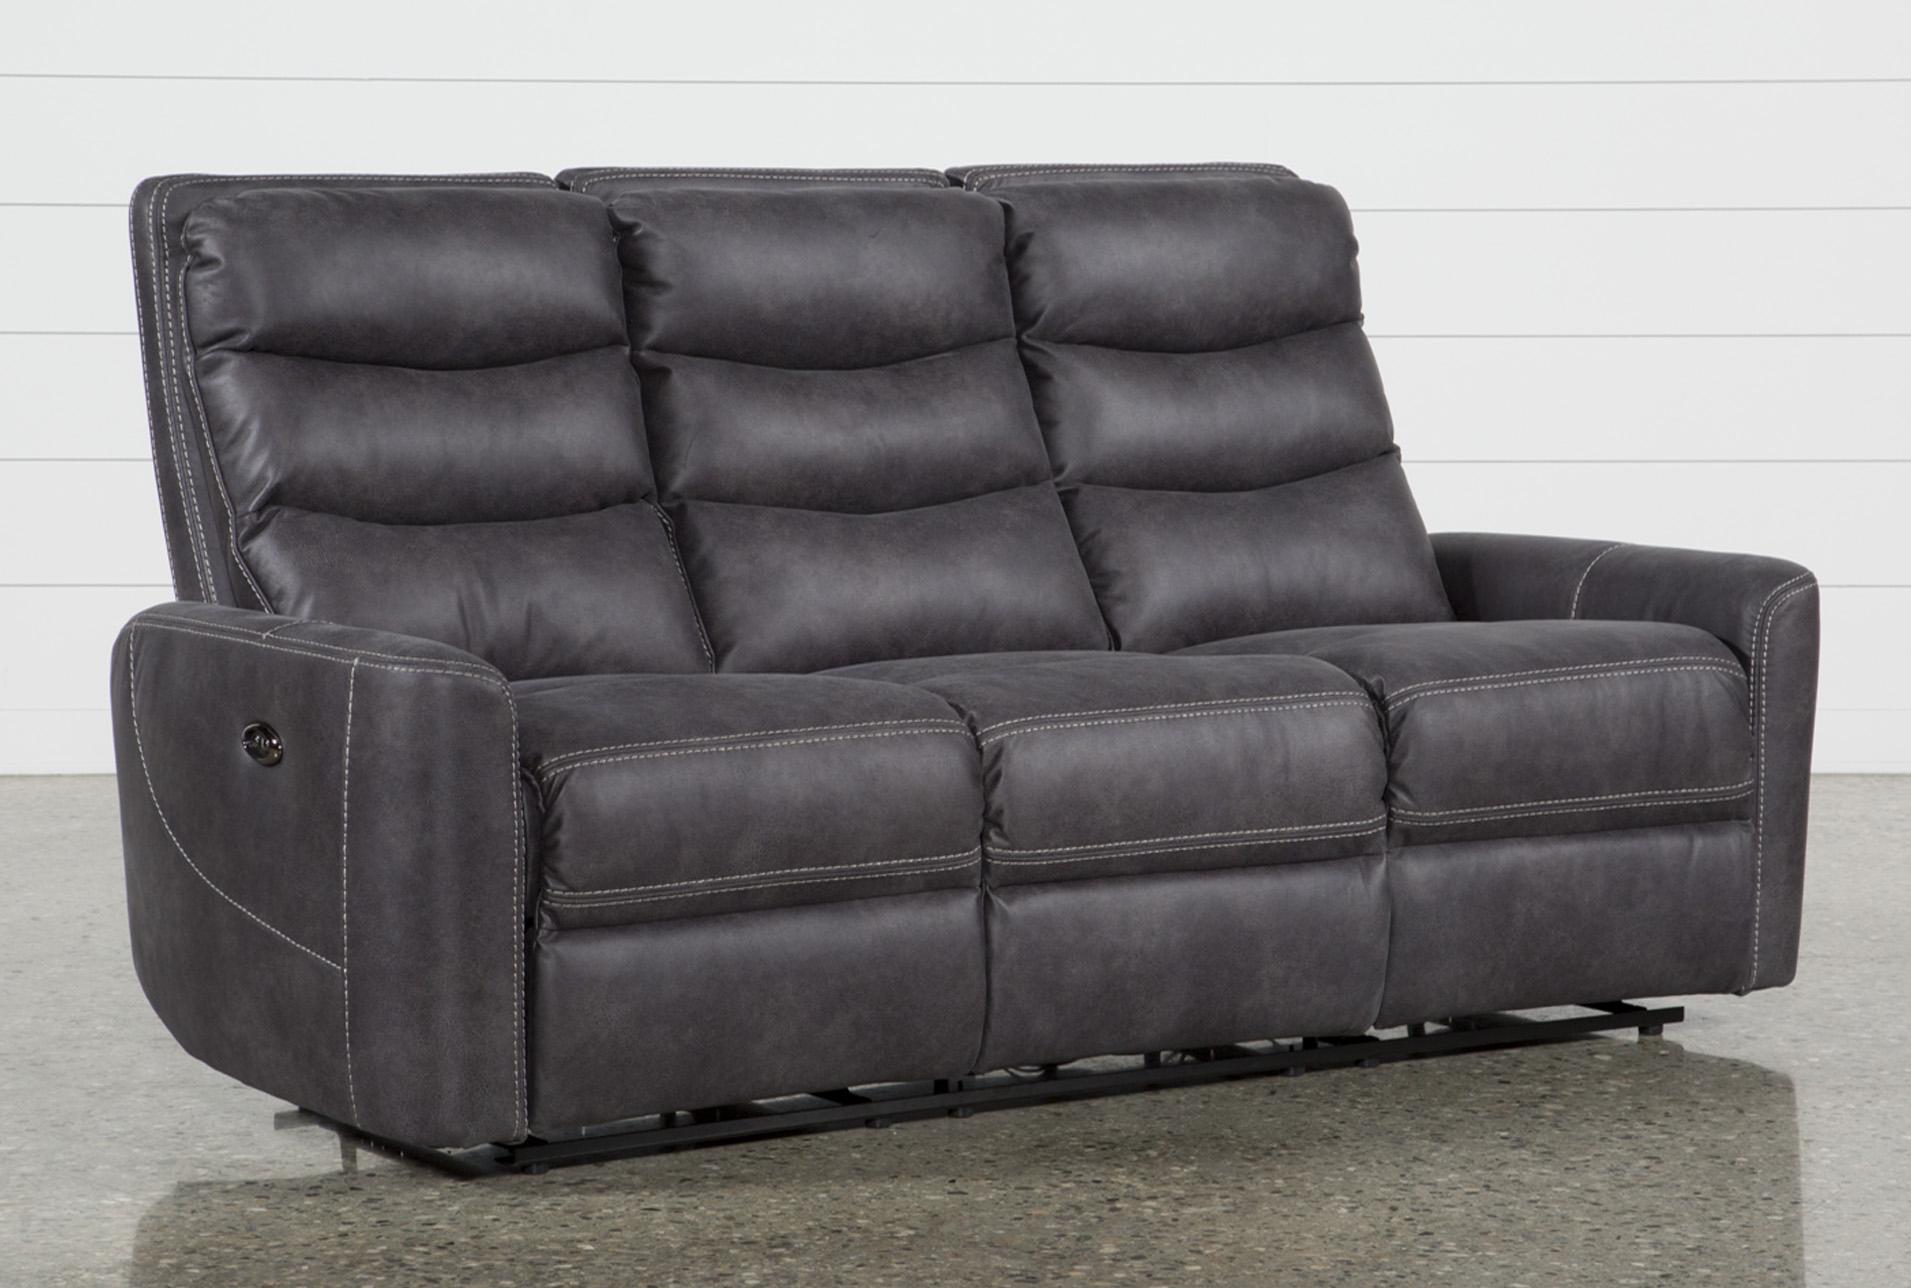 malia power reclining sofa living spaces rh livingspaces com power recliner sofa reviews power recliner sofa brown